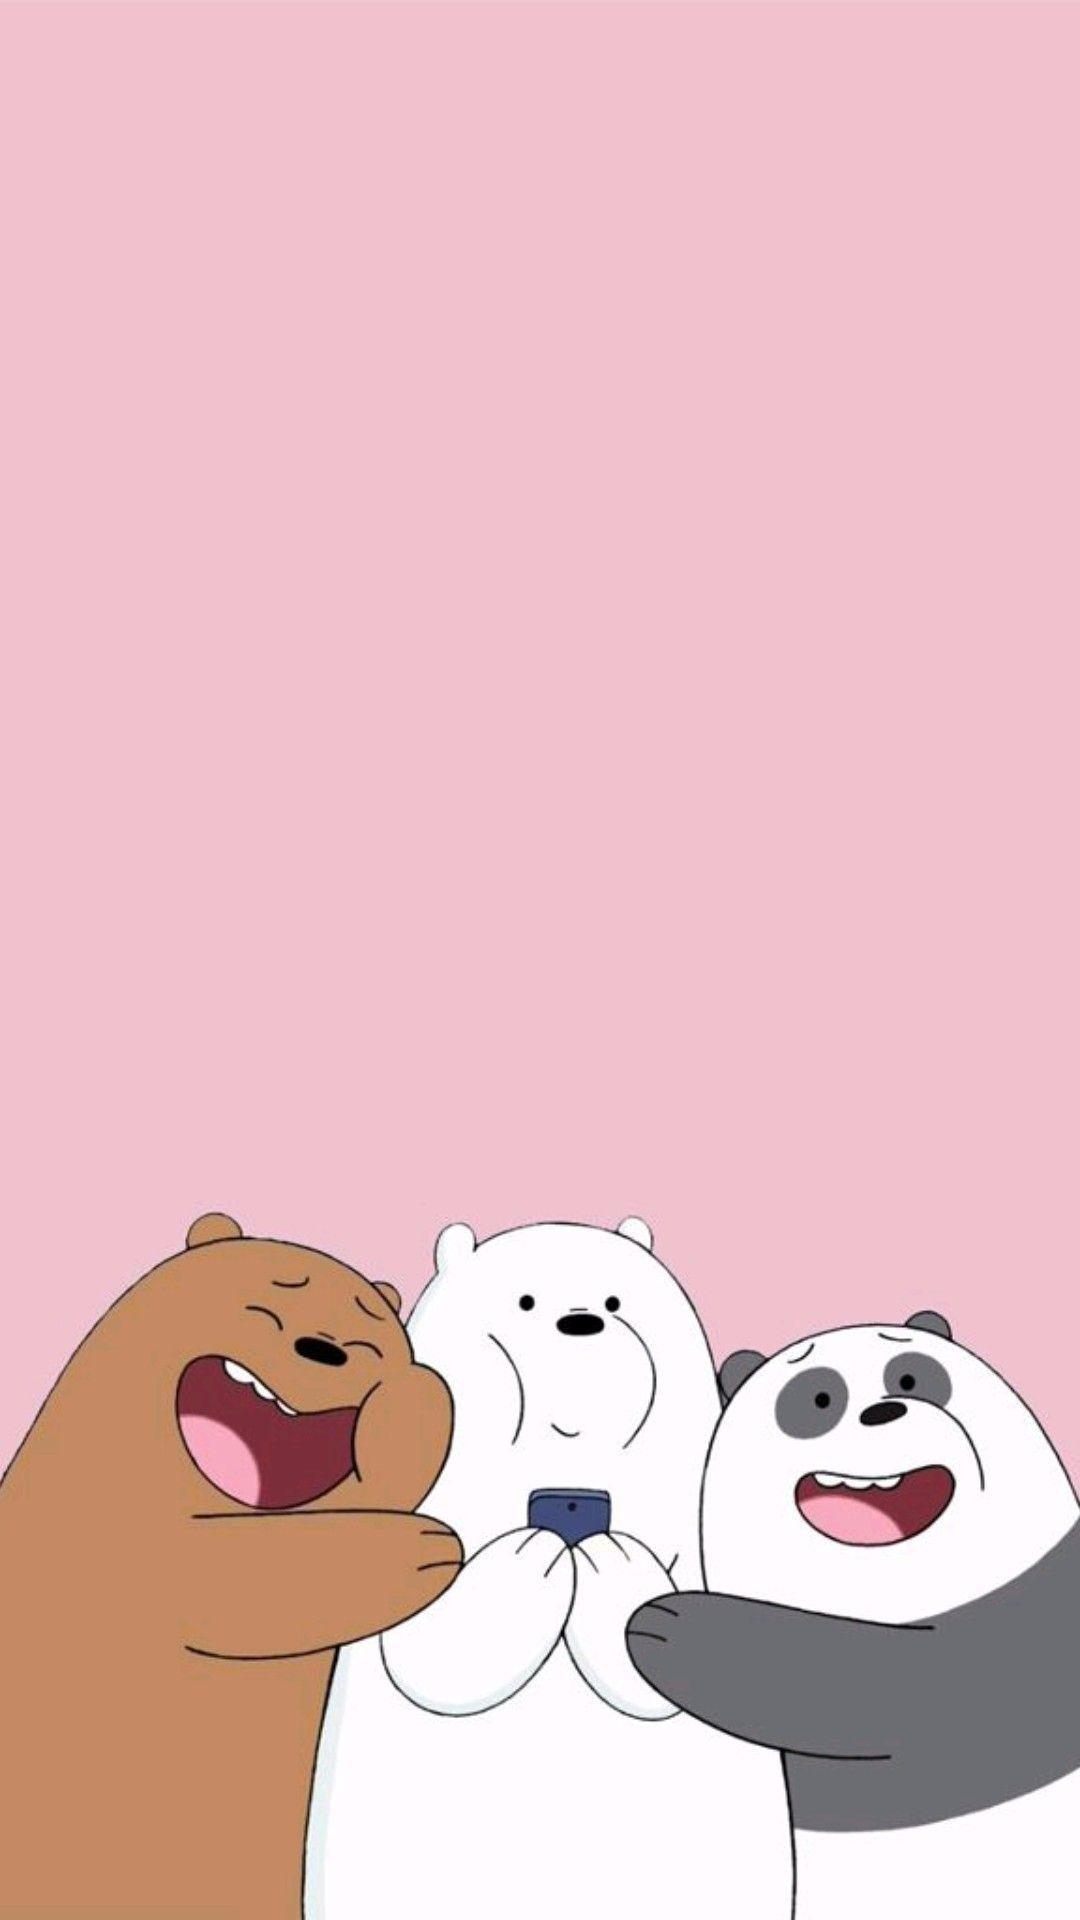 We Bare Bears Wallpaper Hd Wallpaper Kartun Lucu Wallpaper Disney Lucu Wallpaper Iphone Disney